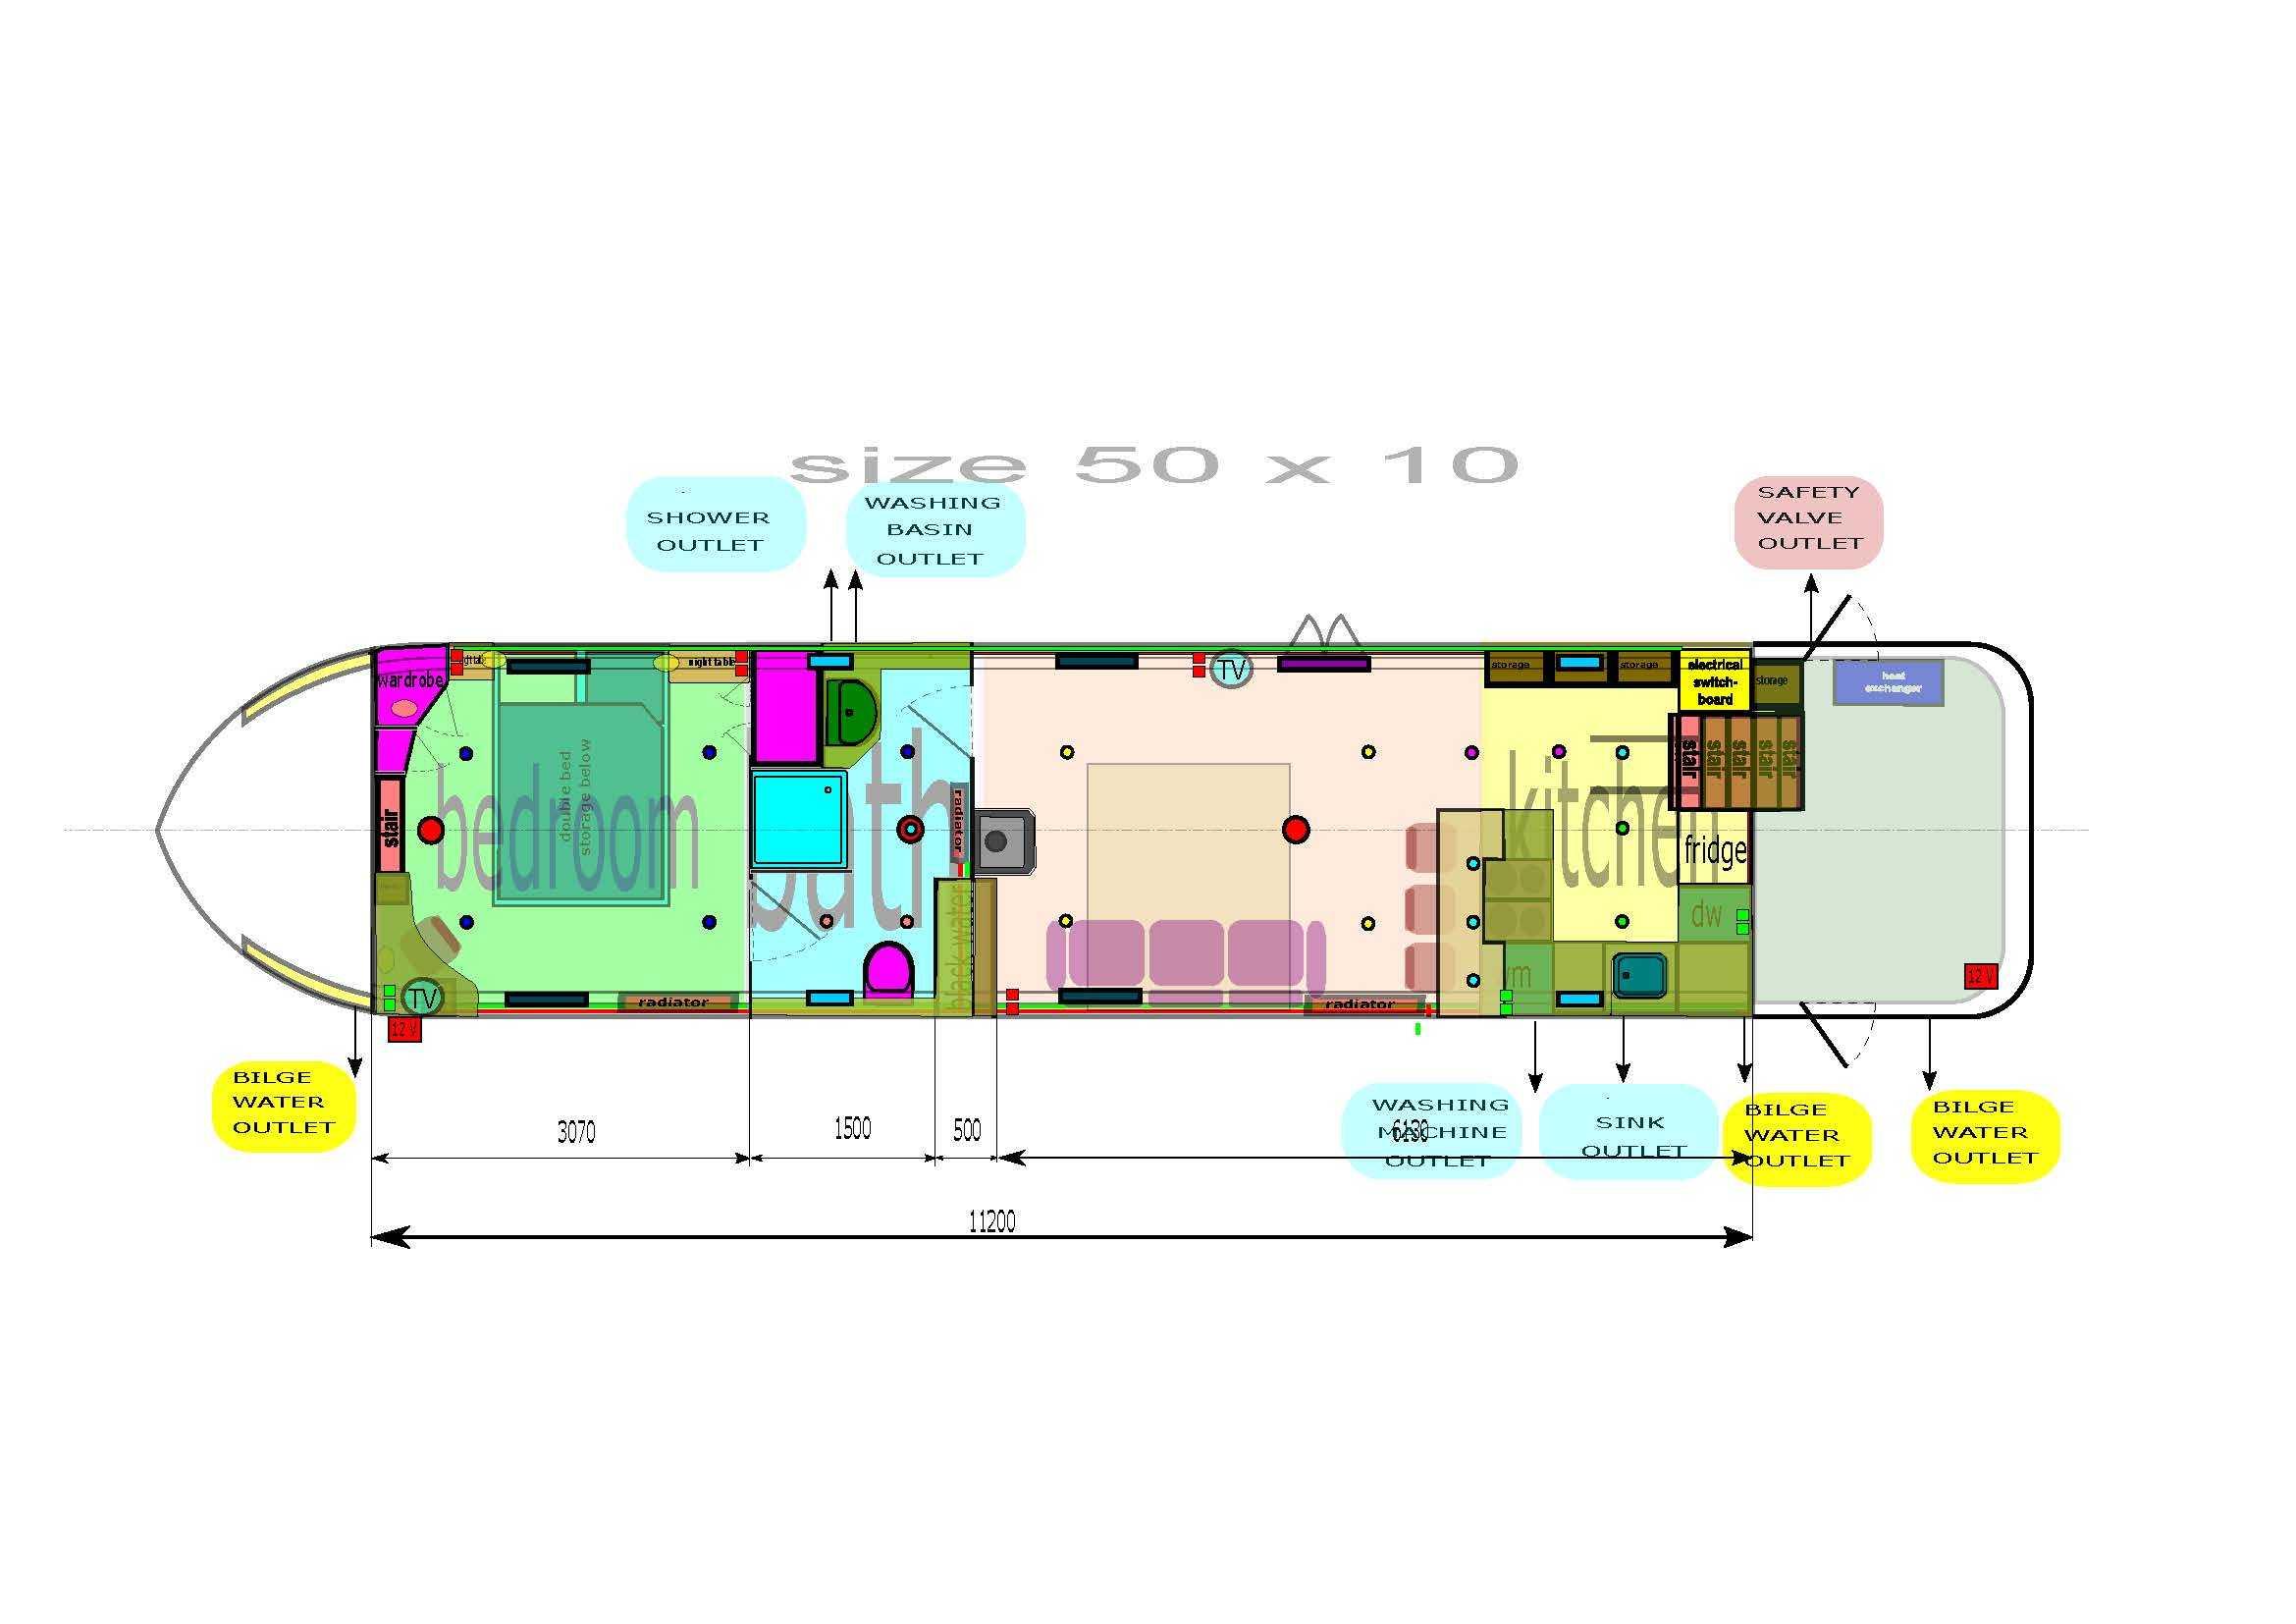 VIKING VCB00215 50x10 final layout v1 1